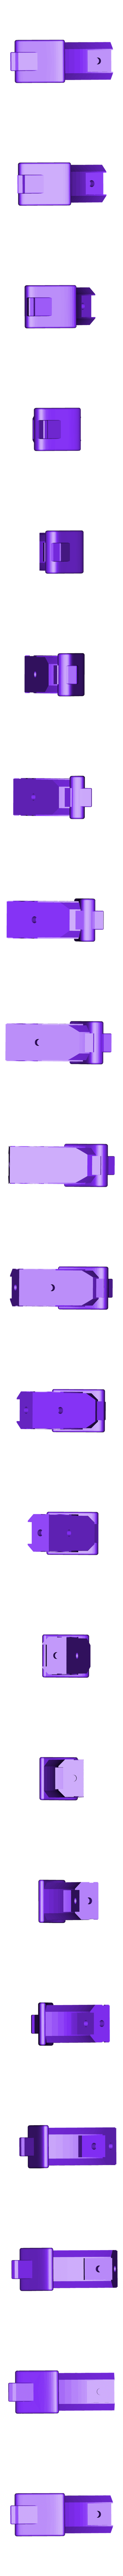 Bottom-TL.stl Download free STL file Full Sized Halo Plasma Pistol • 3D printer template, ChaosCoreTech